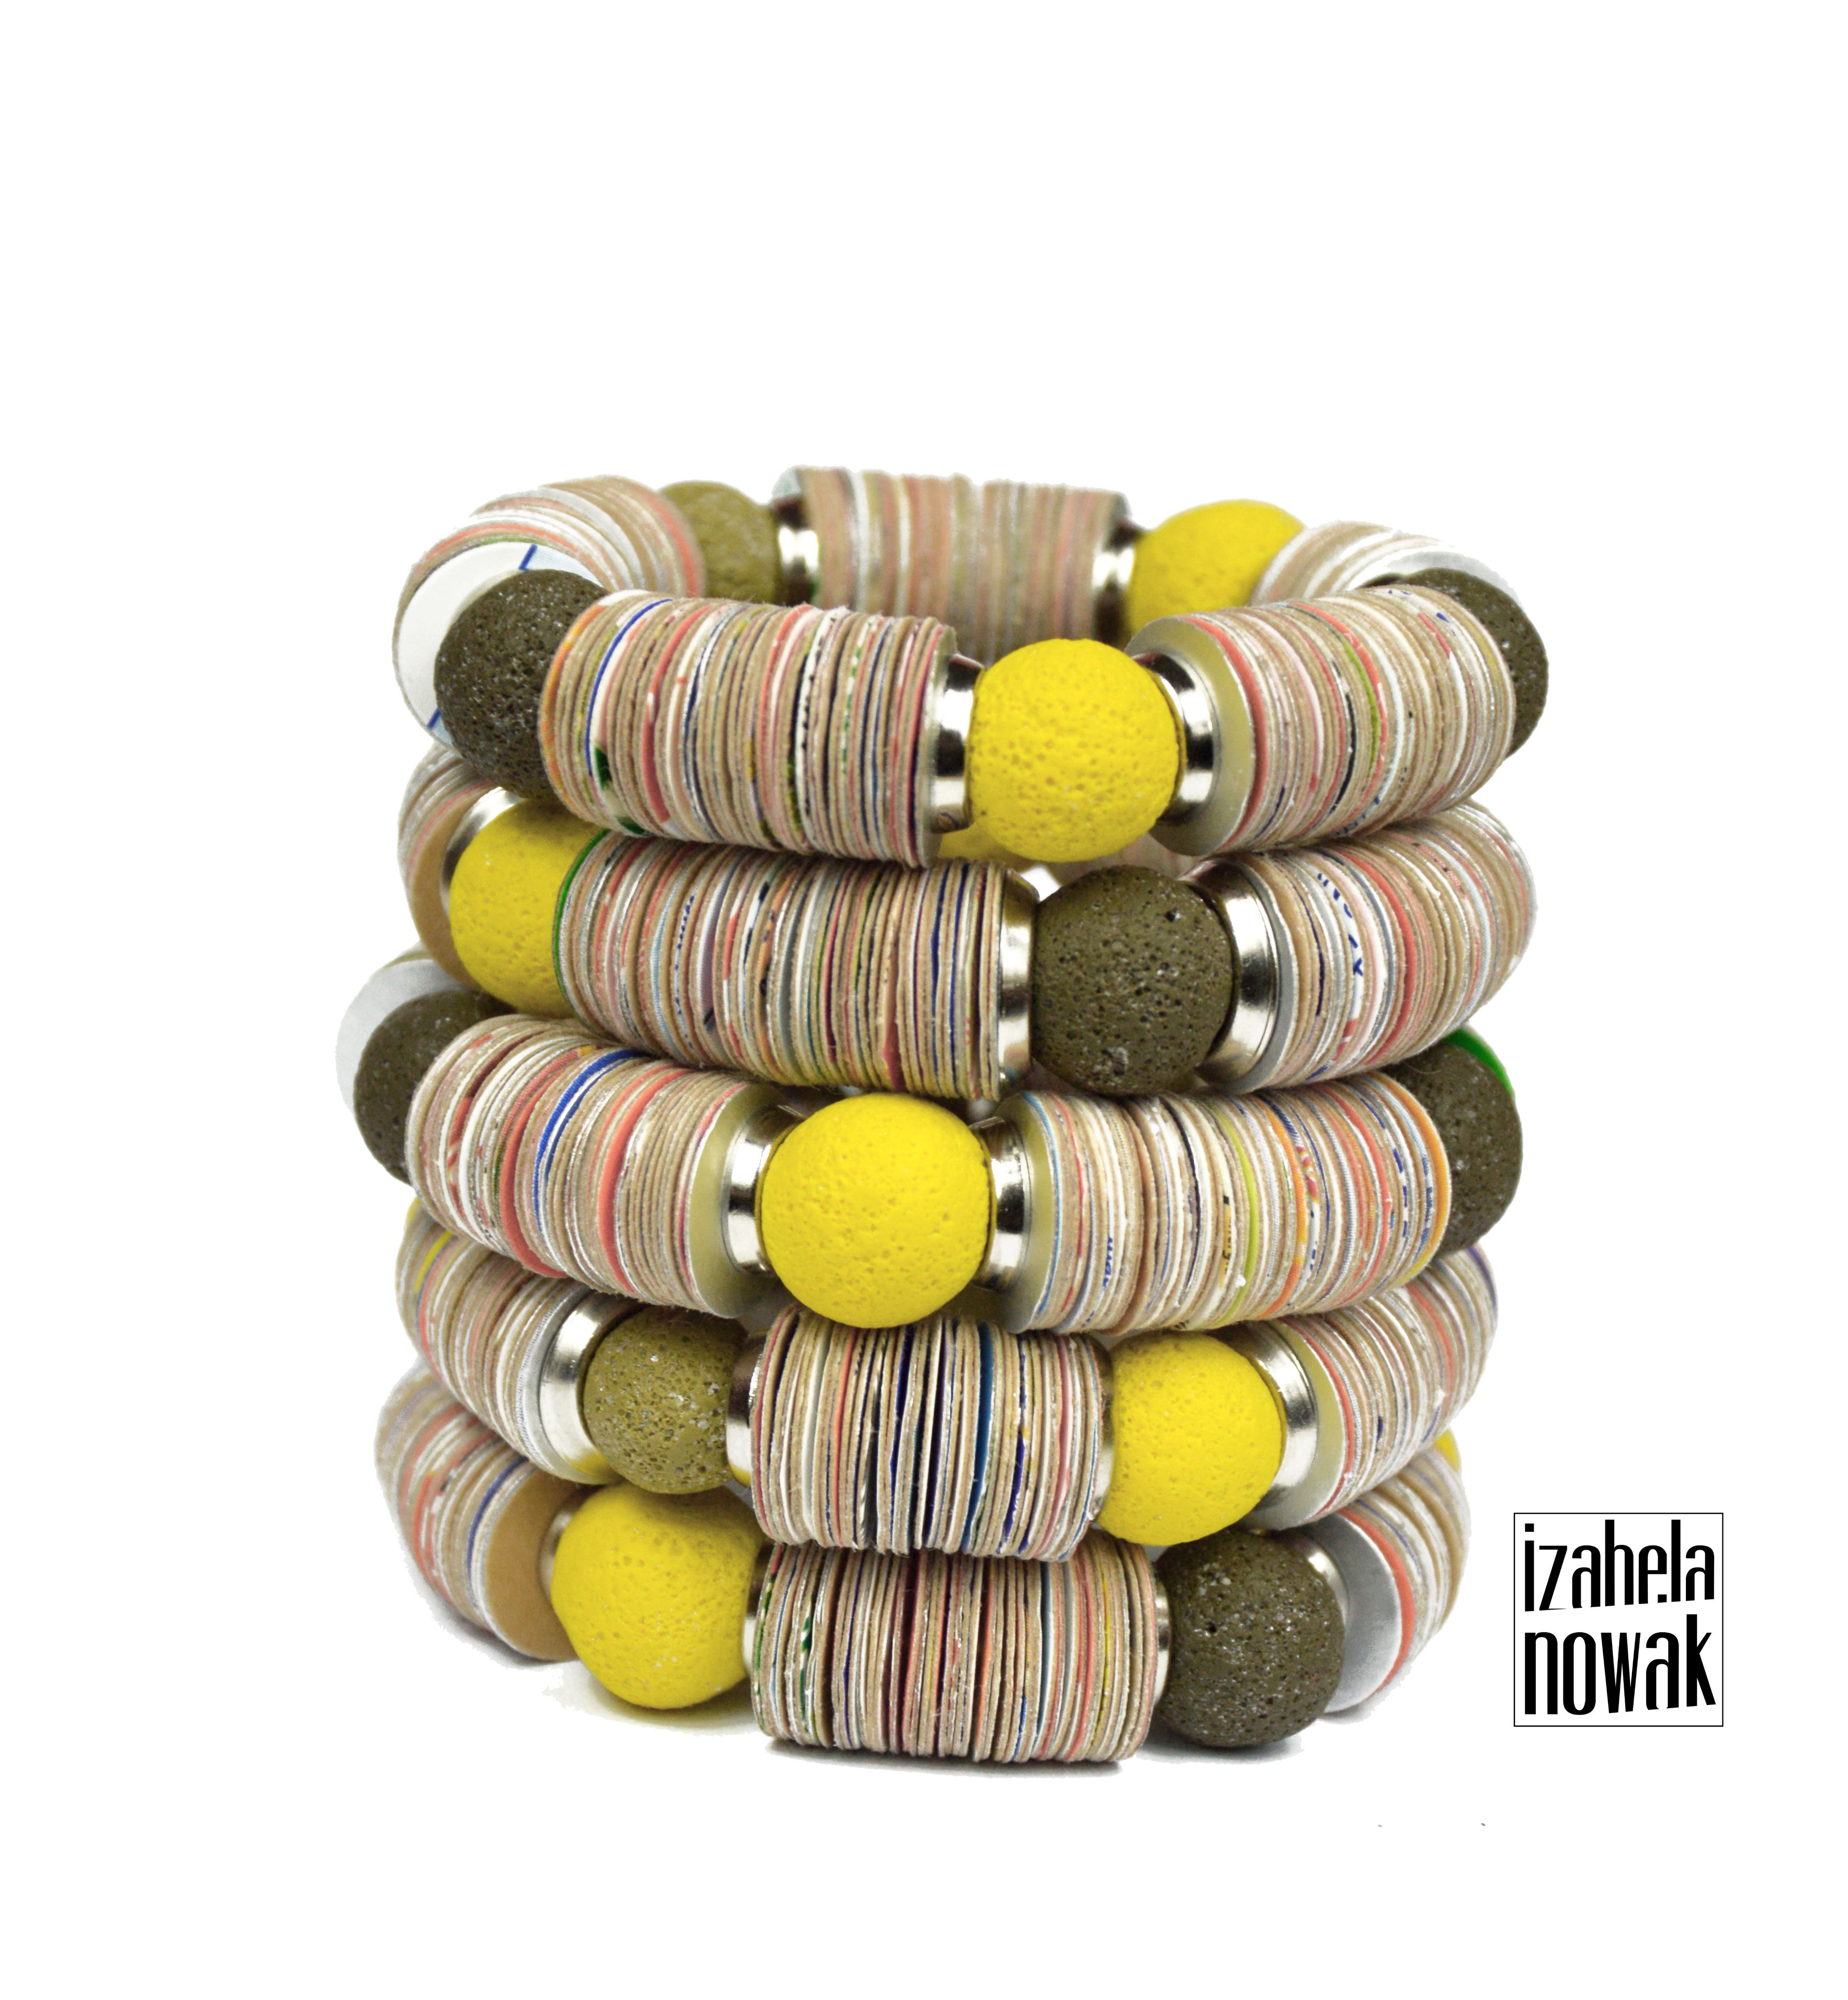 Izabela Nowak / Upcycling / Recycling / Reused / Contemporary ...